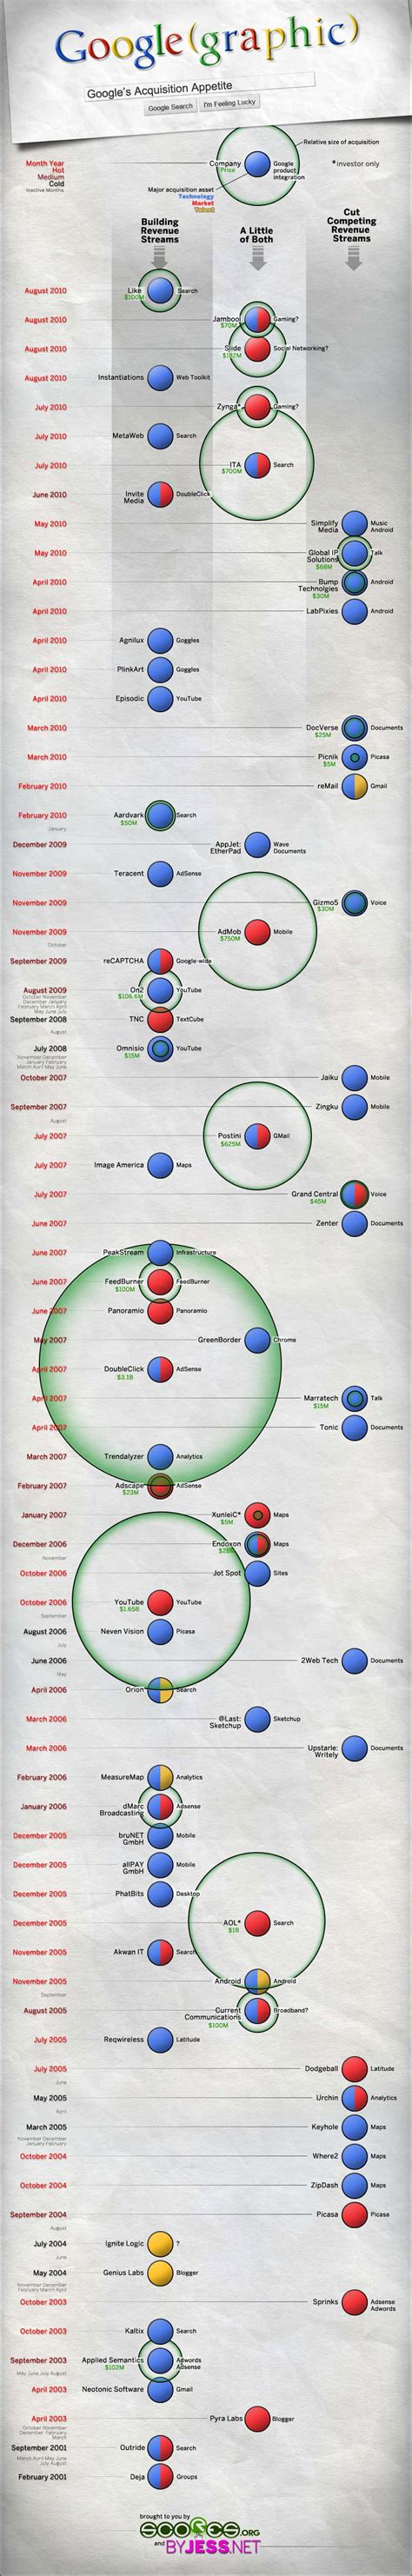 google images infographic infographic google s acquisition map digital buzz blog